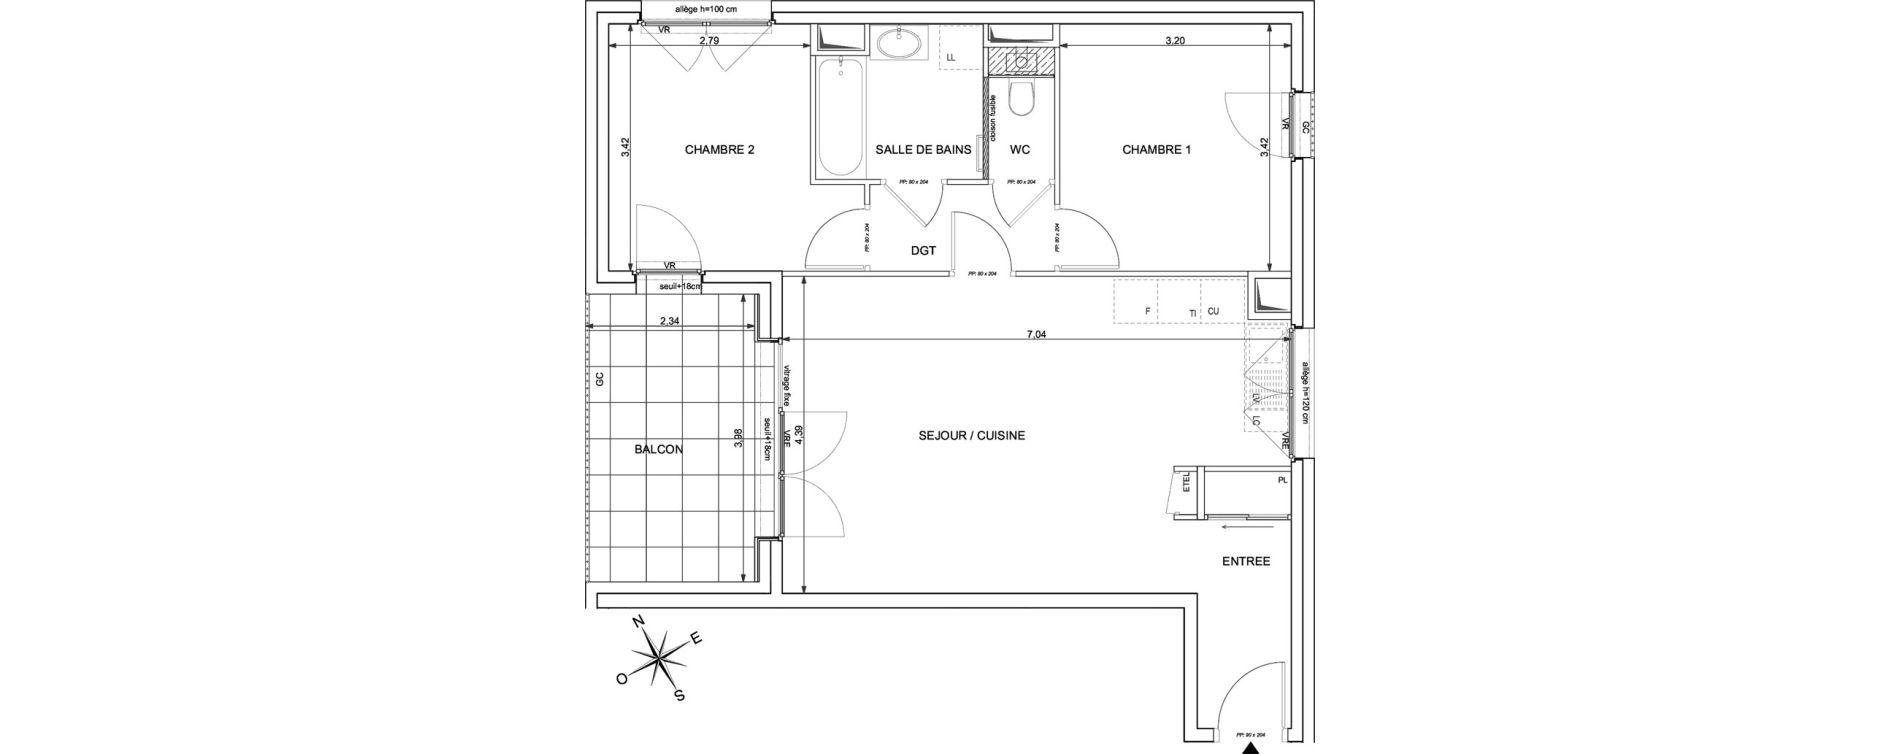 Appartement T3 de 62,99 m2 à Marigny-Saint-Marcel Marigny st marcel